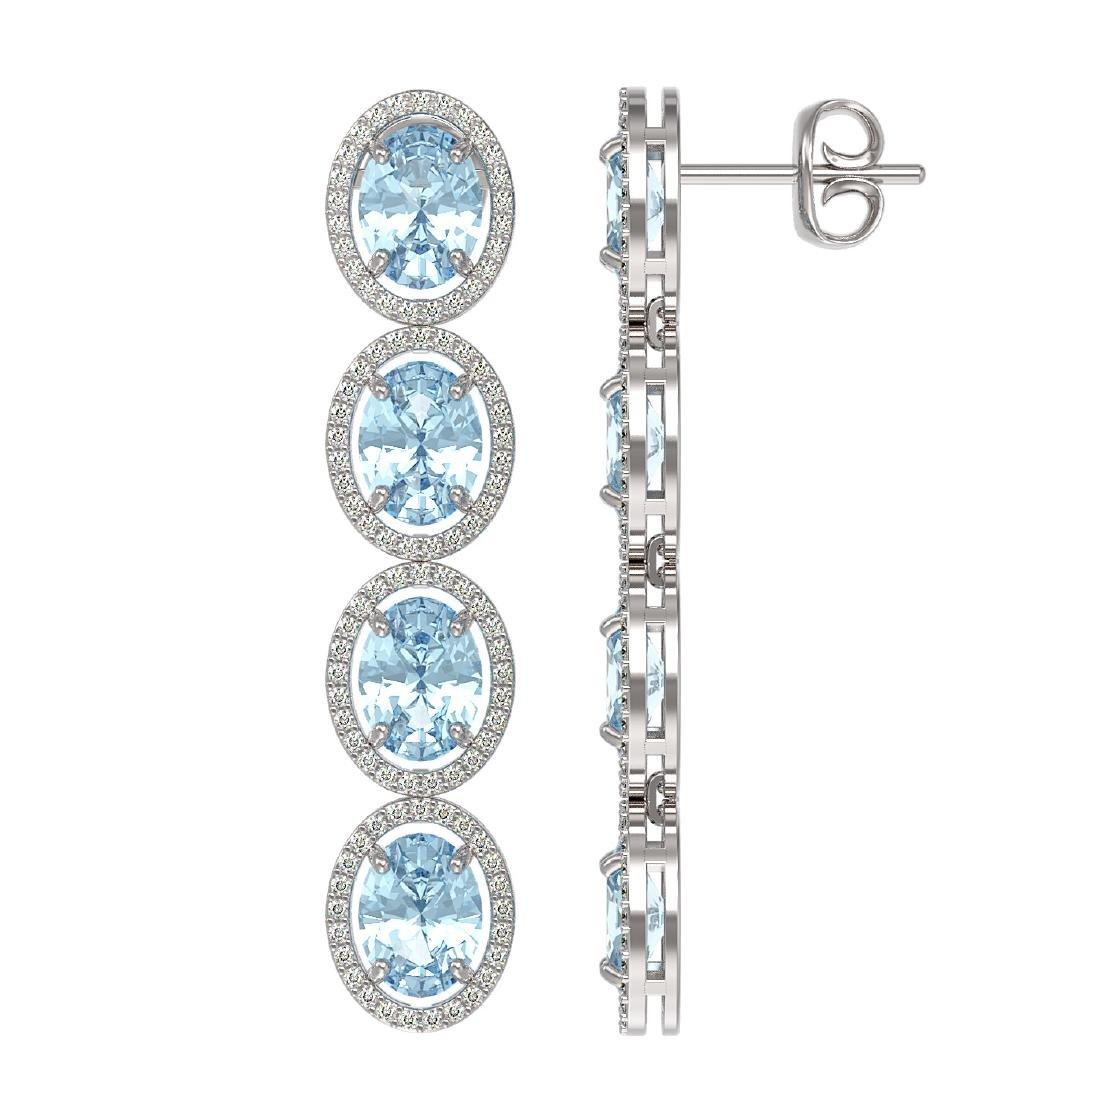 11.72 CTW Aquamarine & Diamond Halo Earrings 10K White - 2